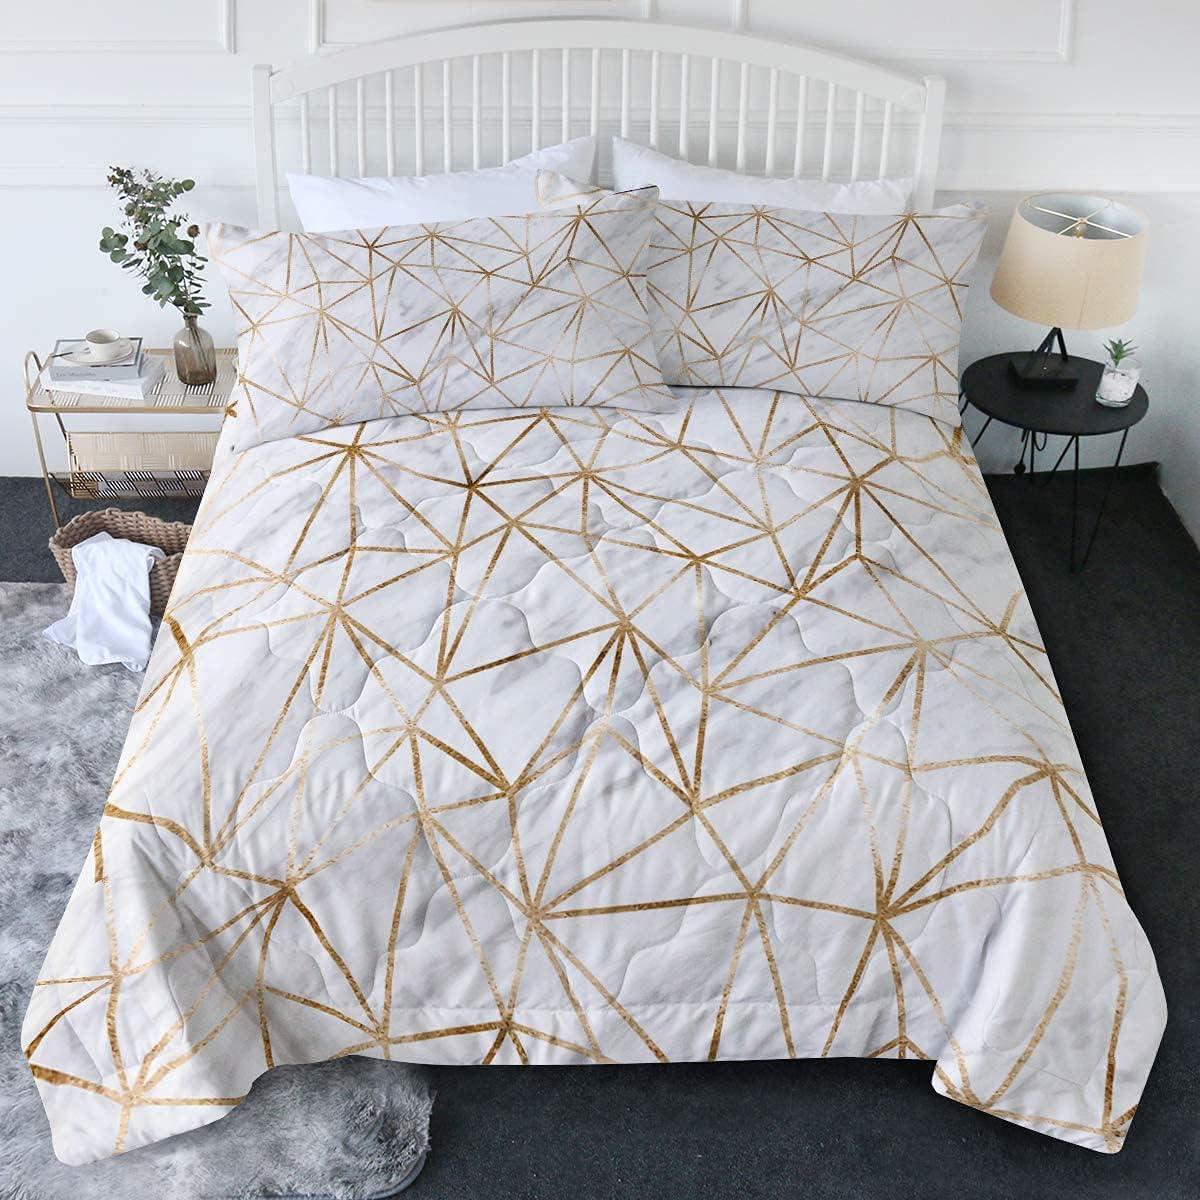 Houston Mall BlessLiving 3D Marble Gold Comforter with Shams Pillow 2 Sale price White M